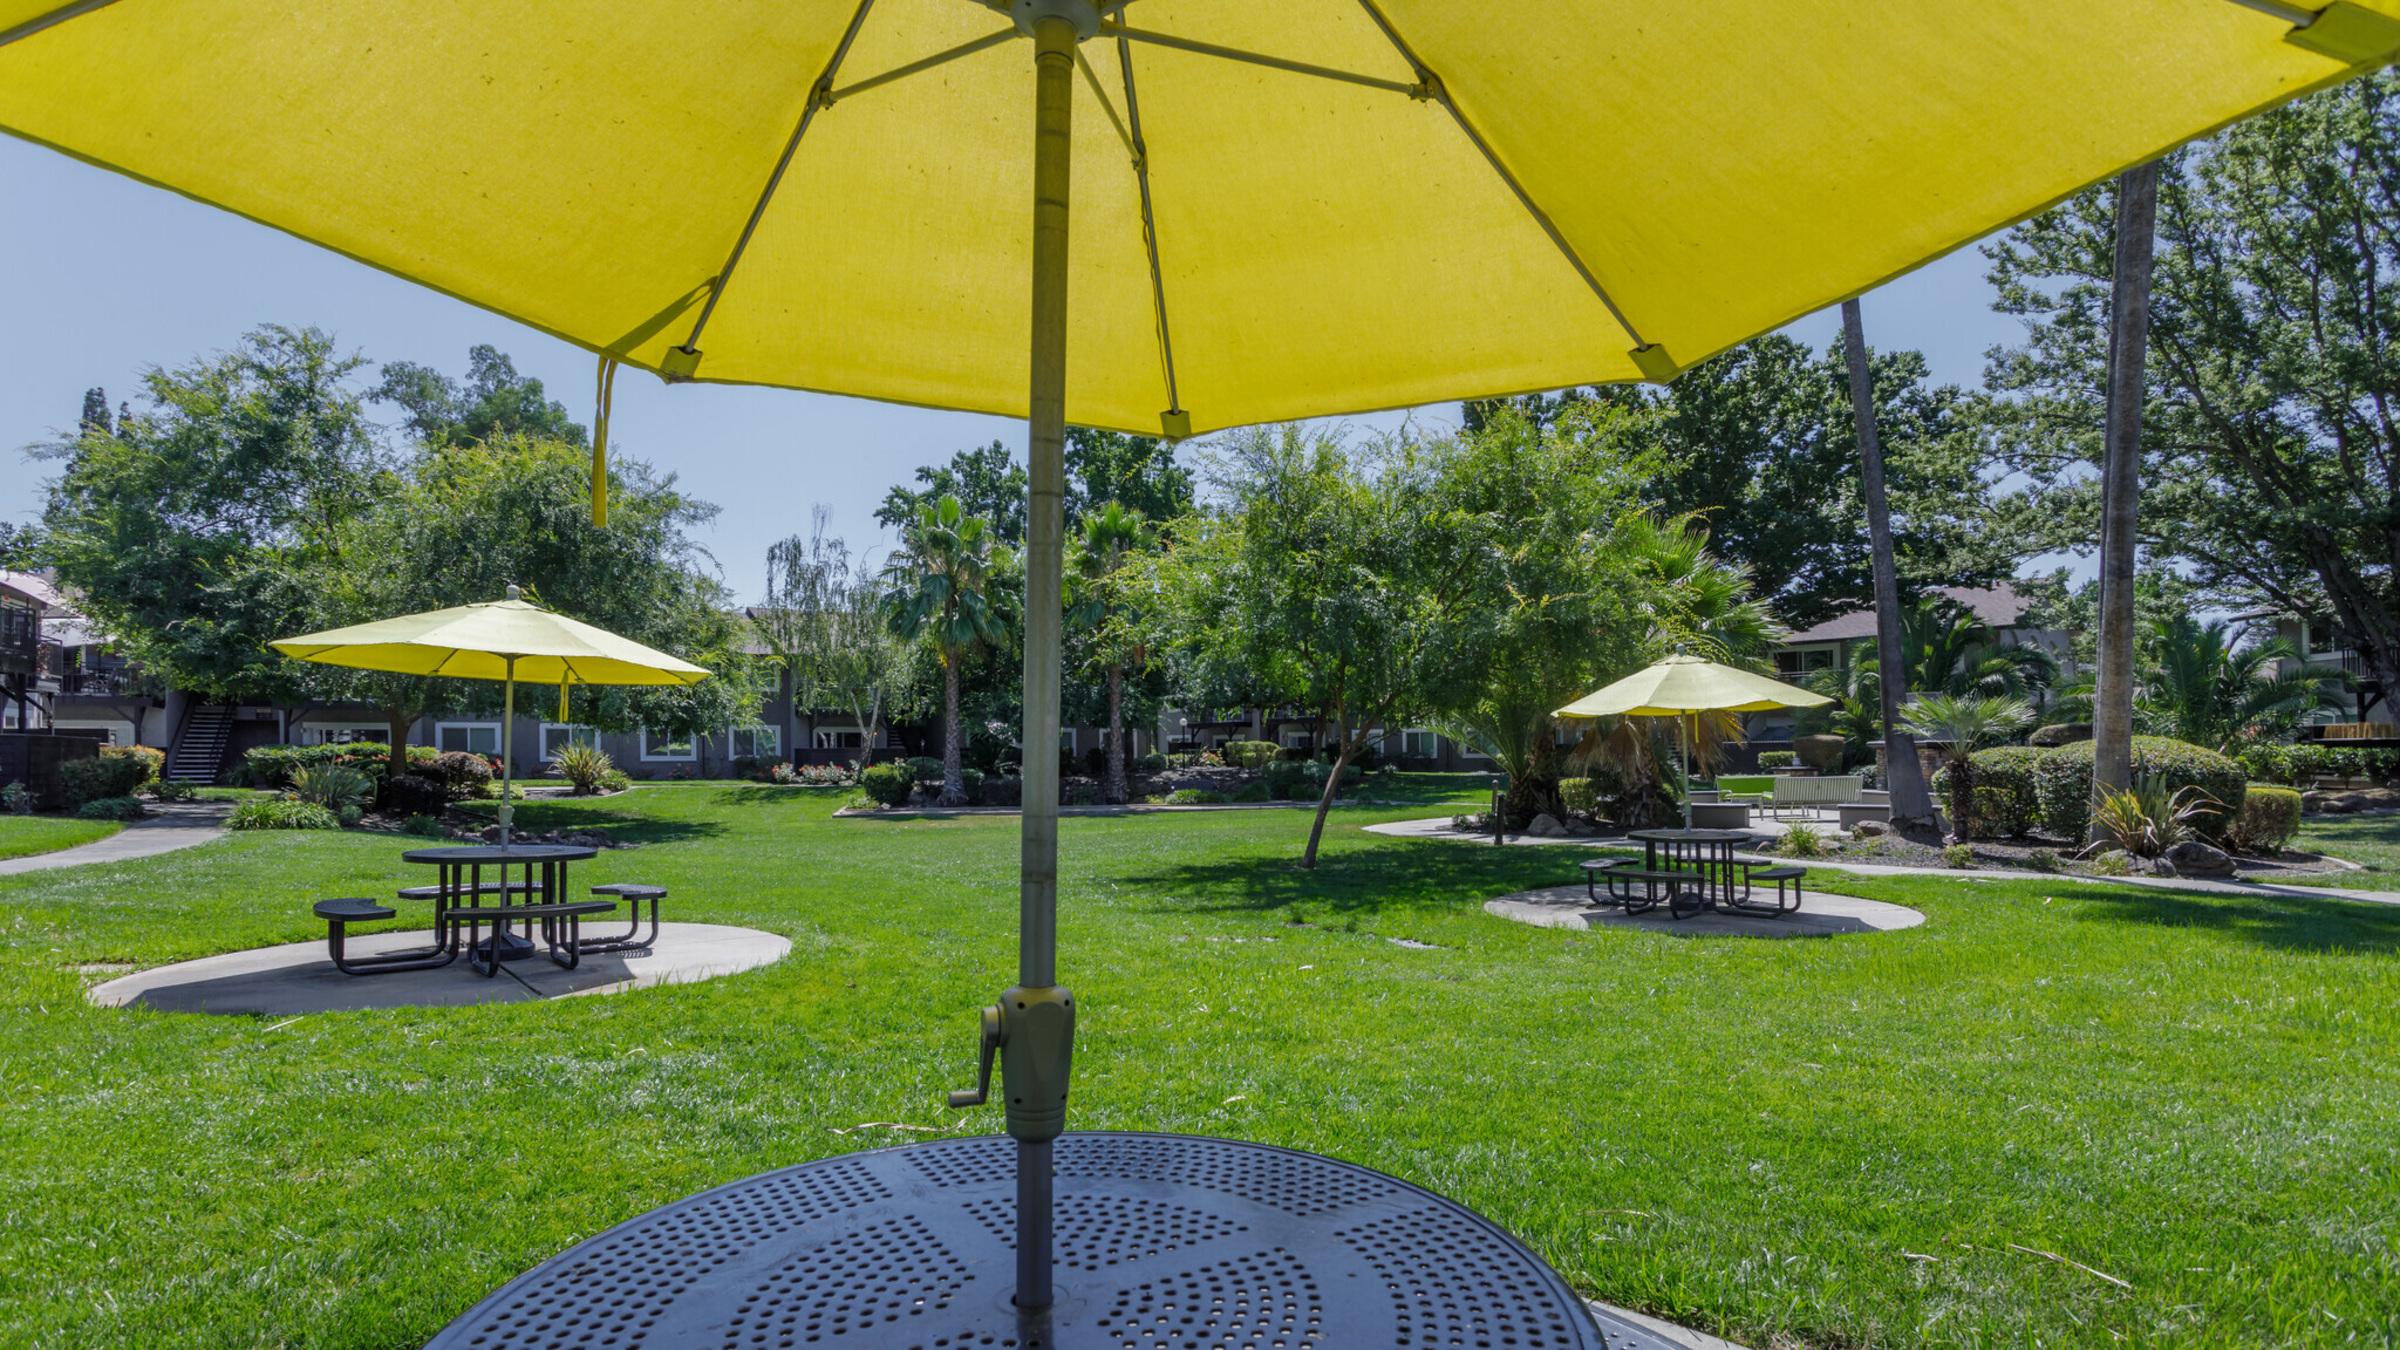 Park Place at Fair Oaks